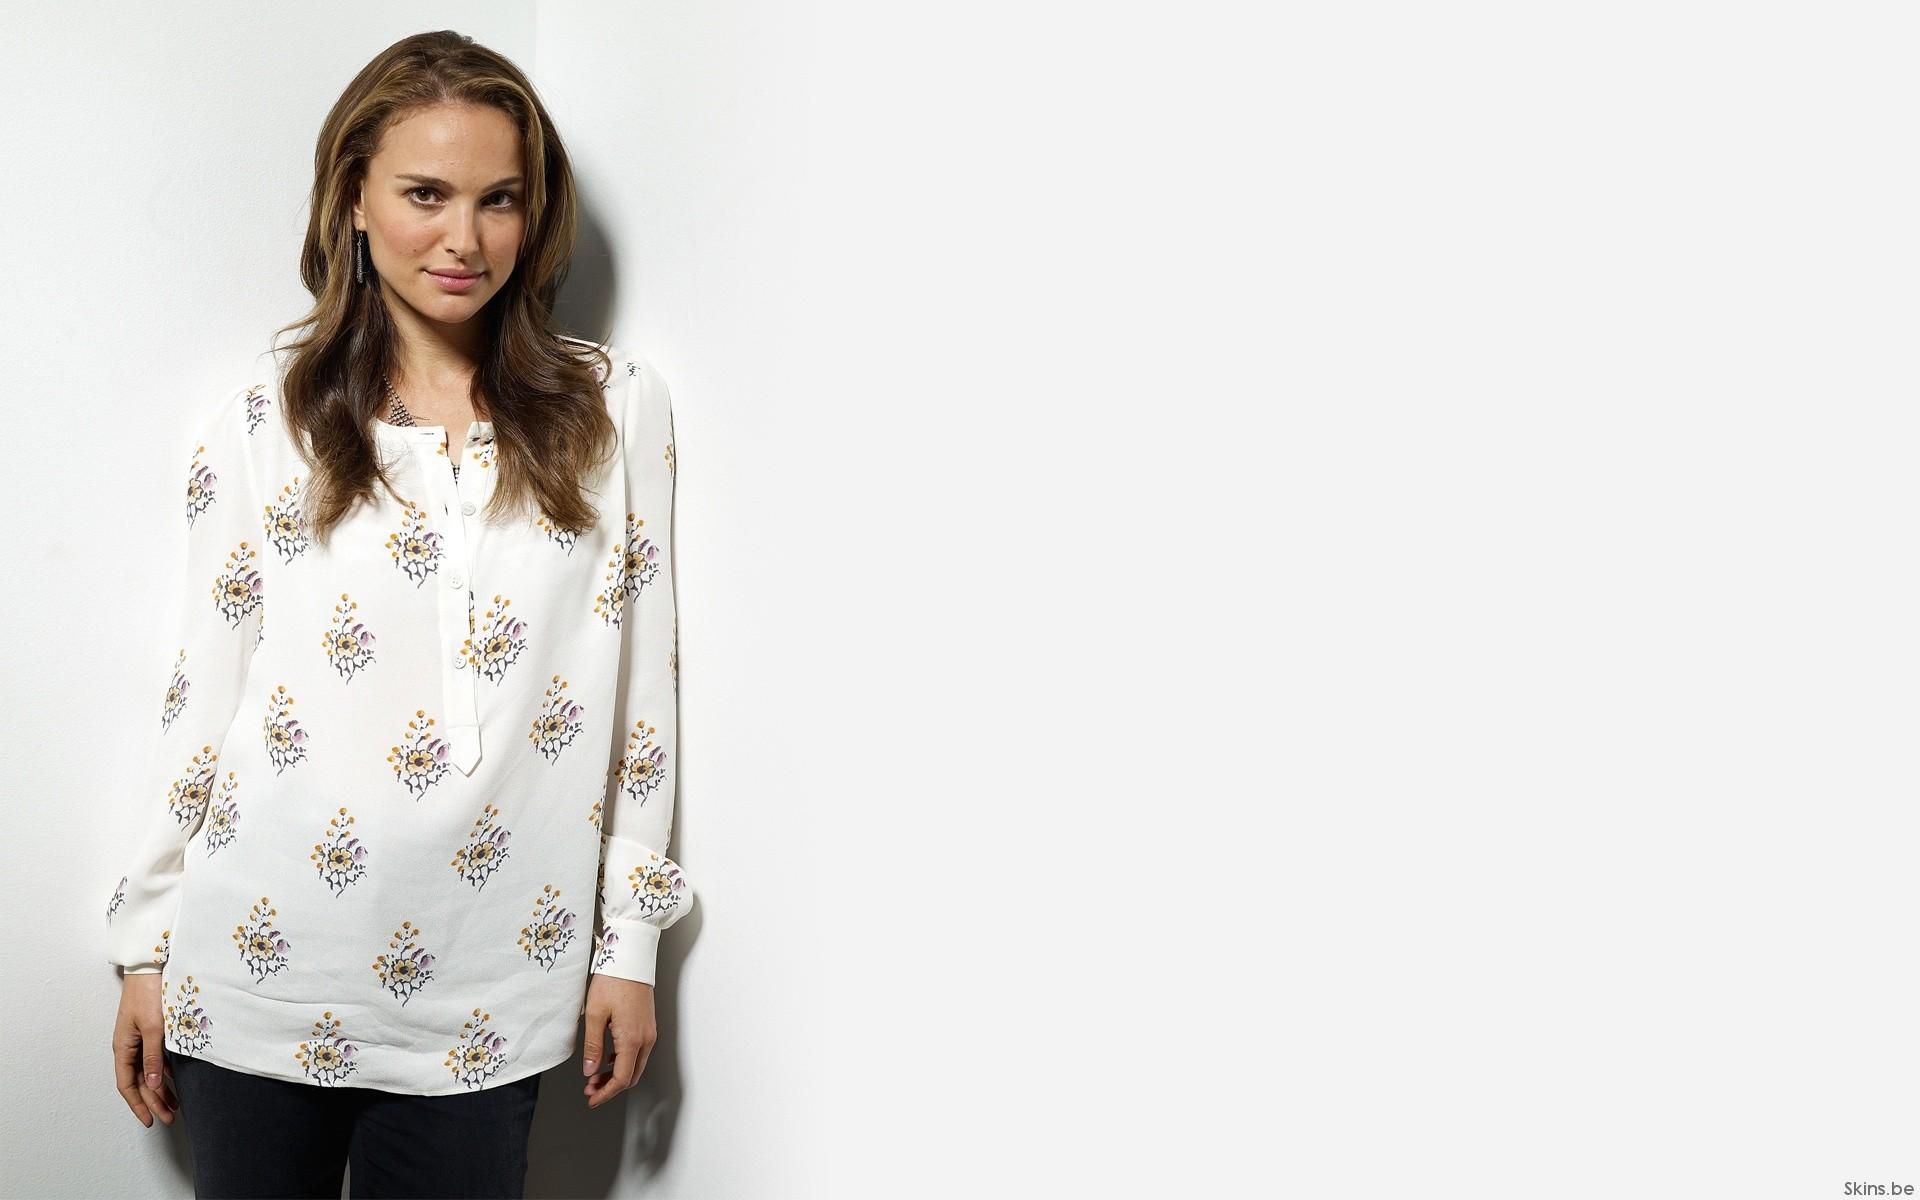 Natalie Portman Actress Wiki,Bio,Age,Profile,Boyfriend,Images | Full Details